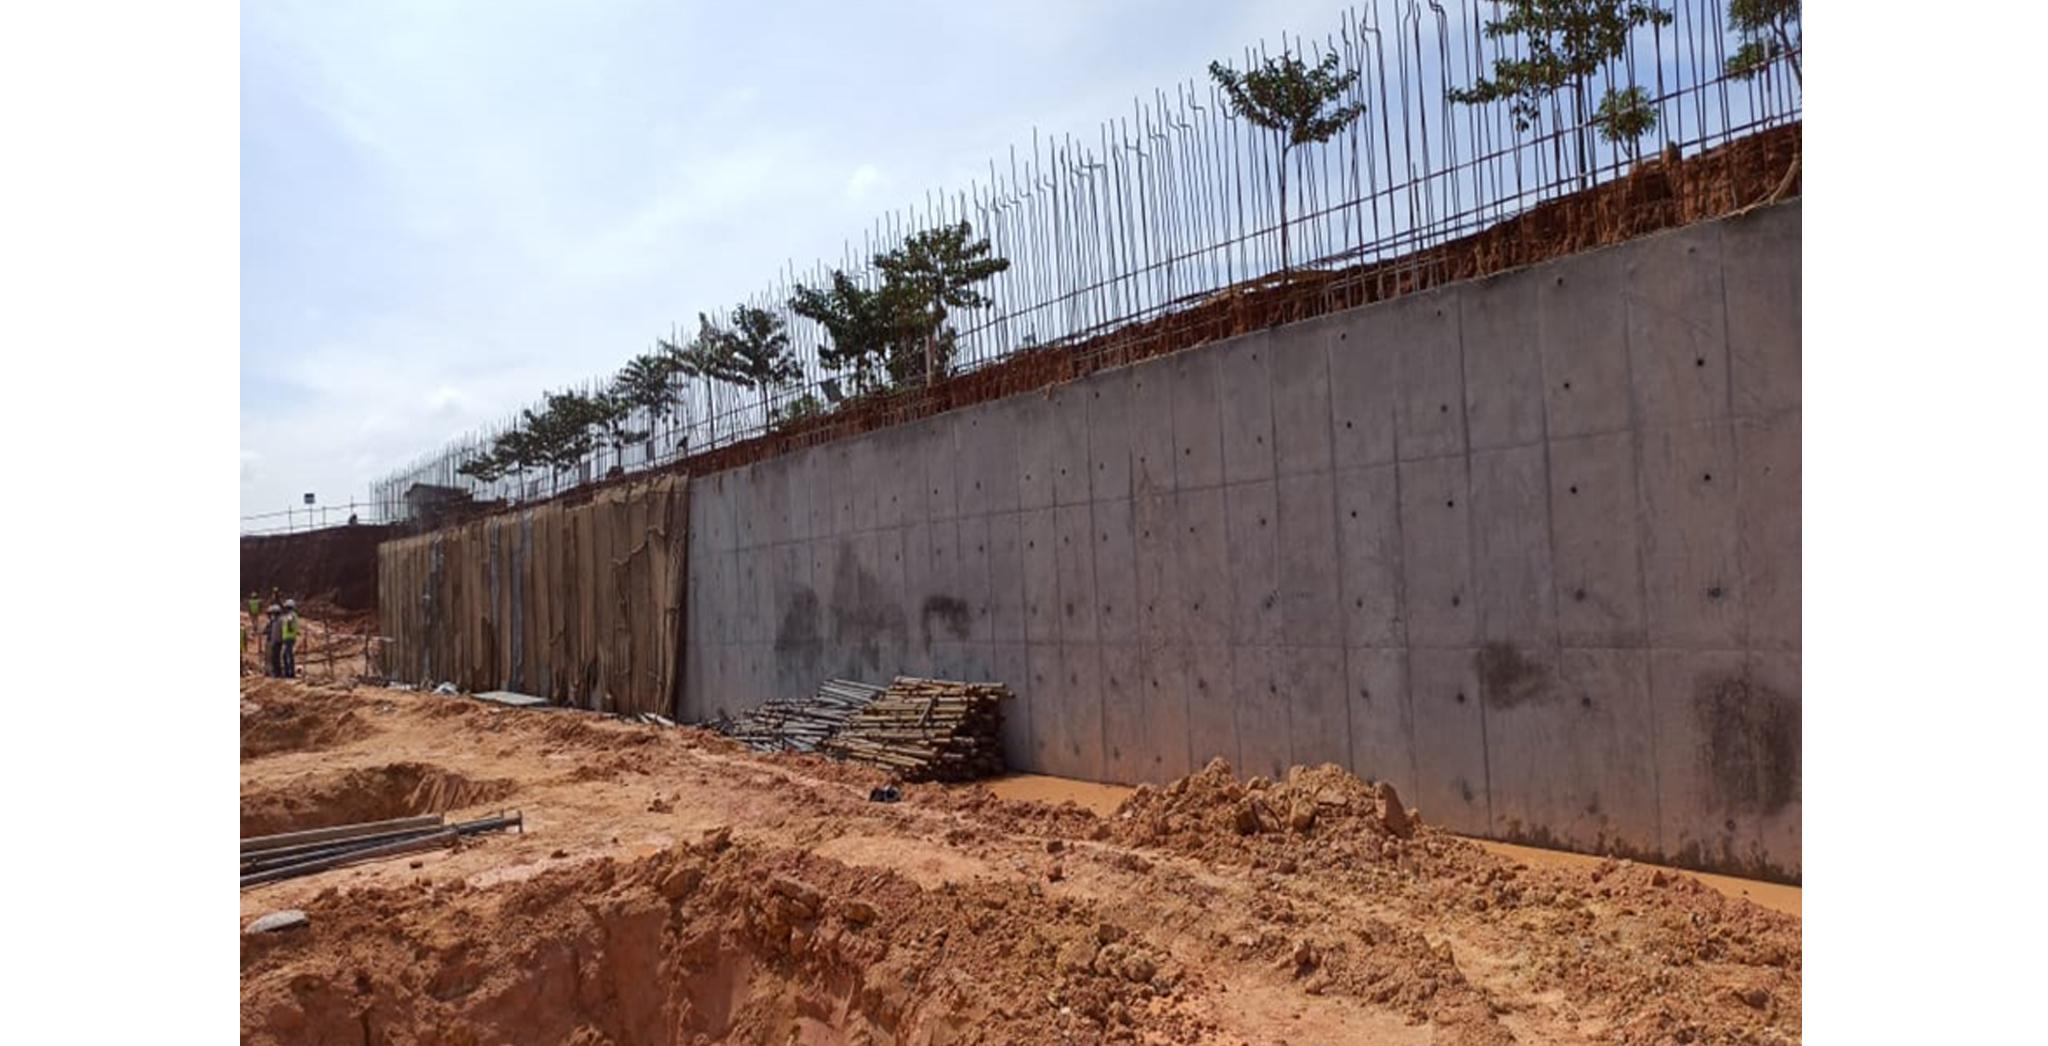 Aug 2021 - Krypton Block: Retaining wall towards south side in progress